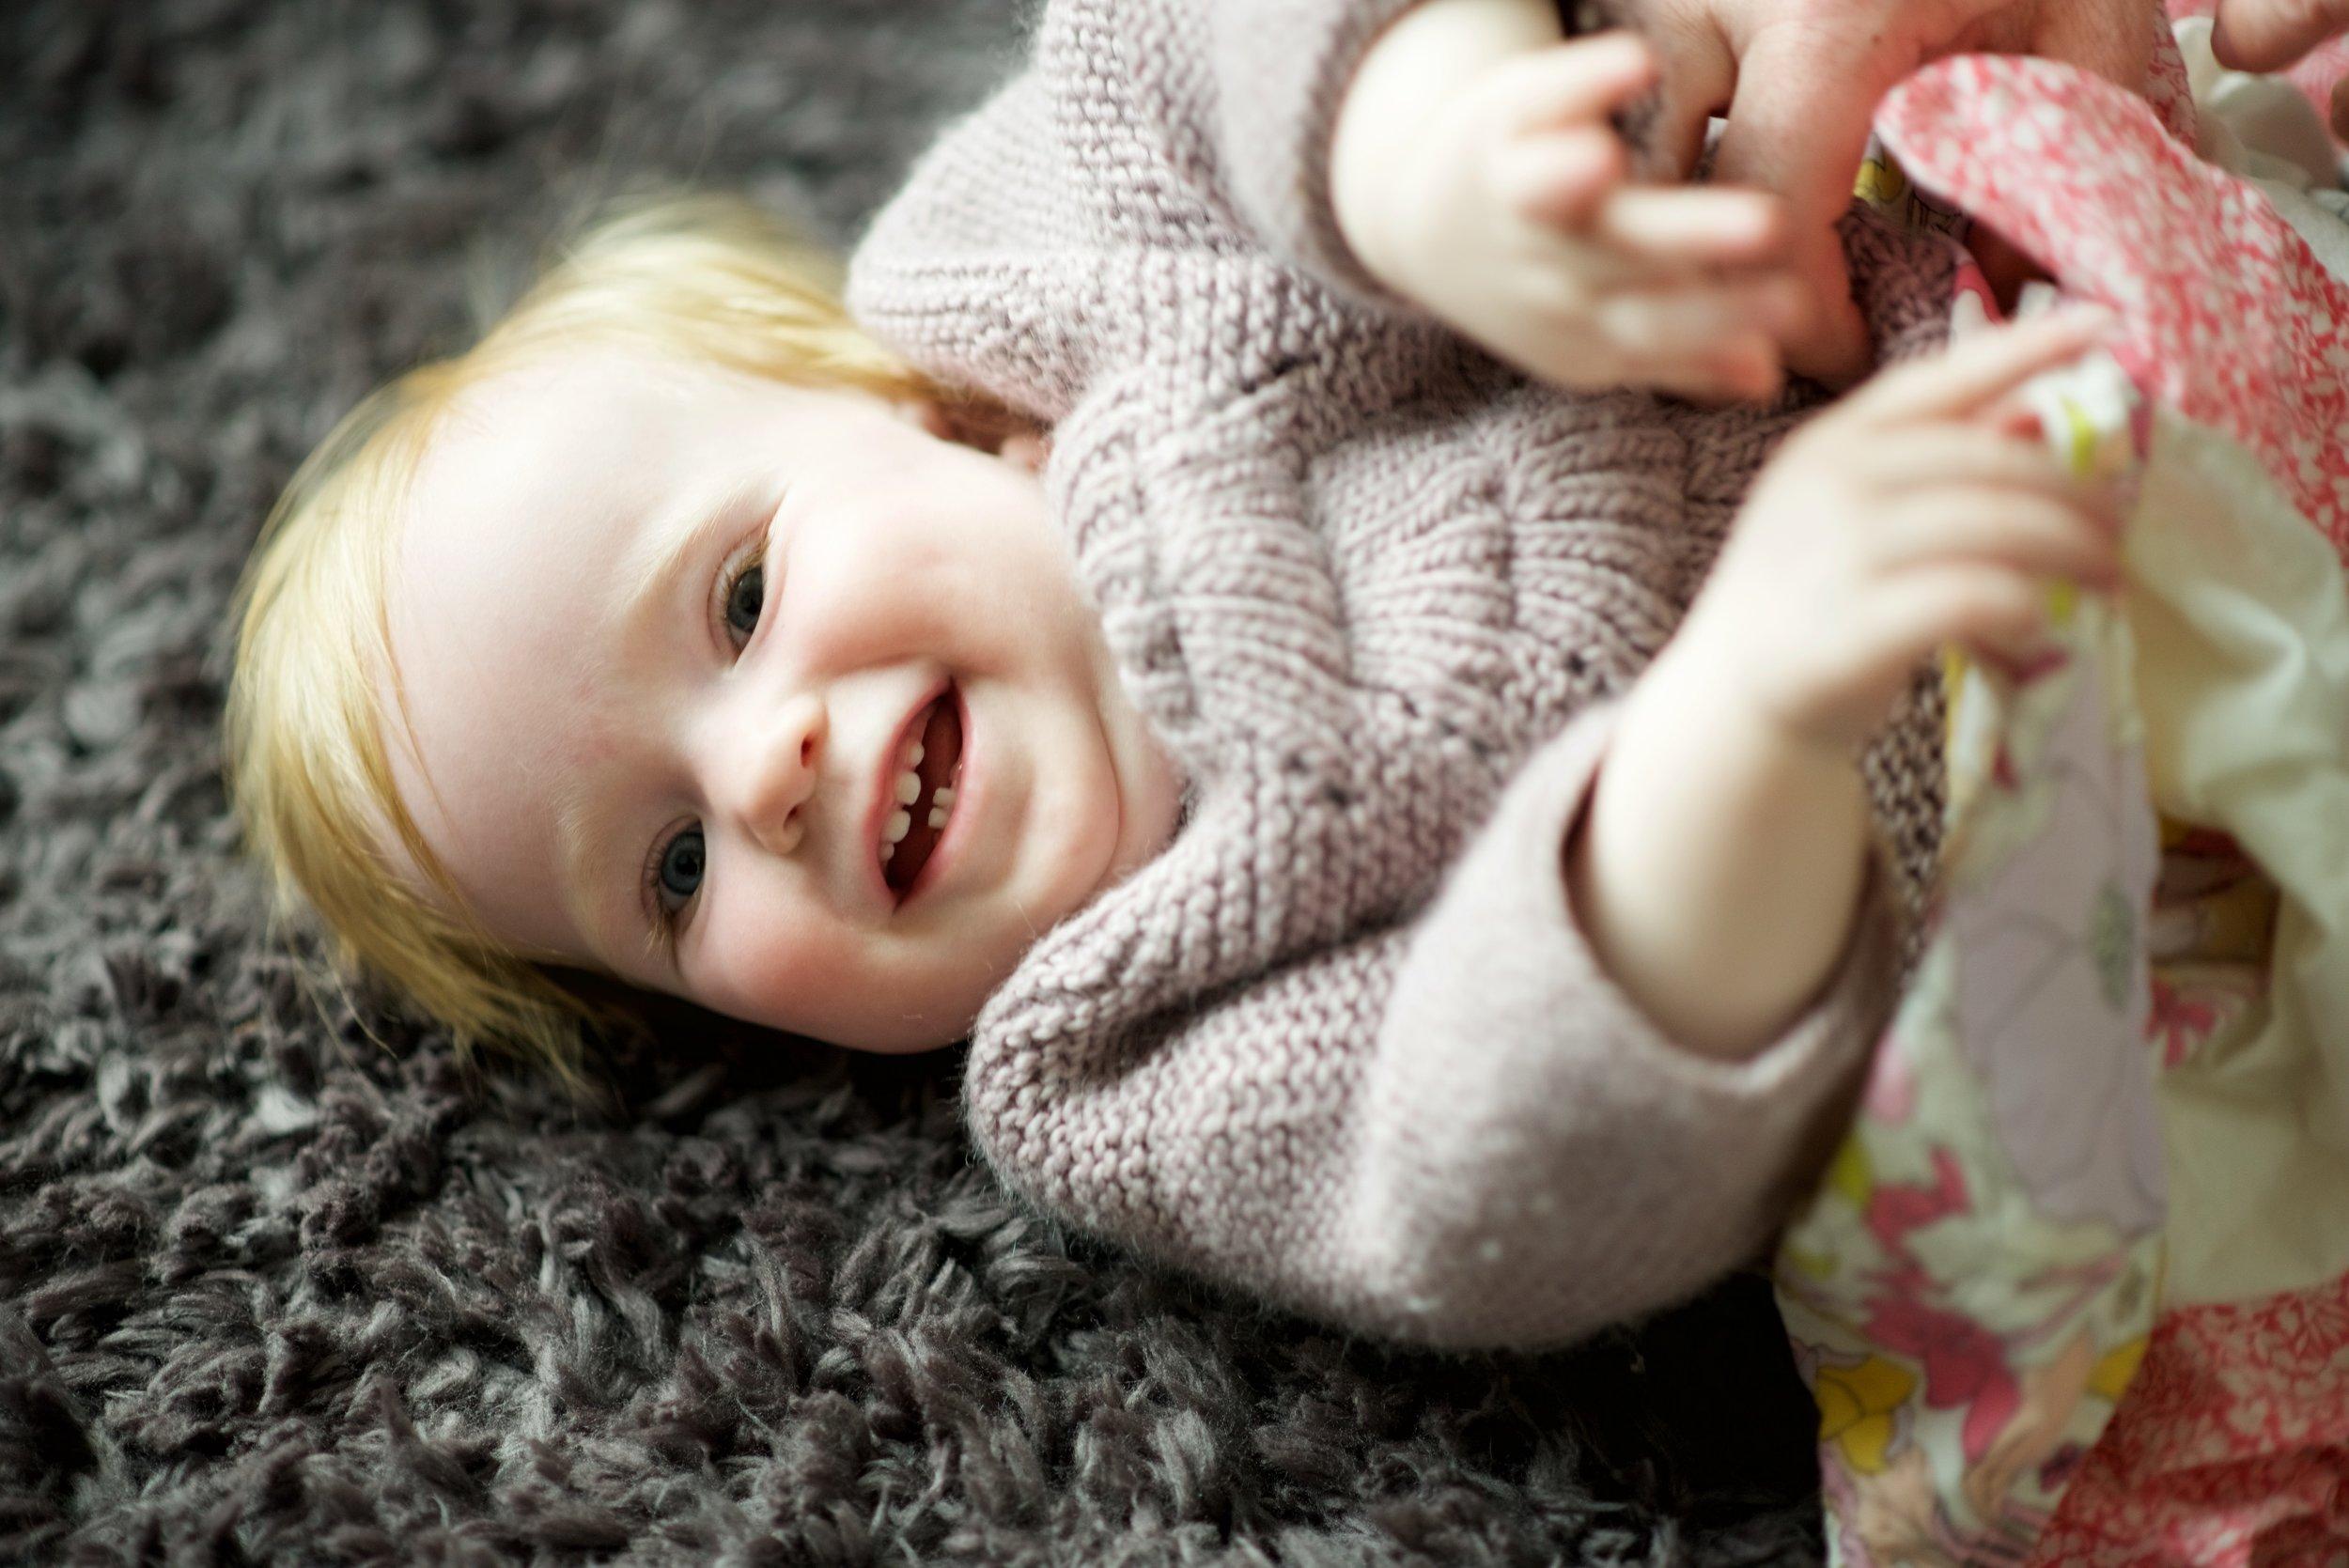 lindseyjane_children025.jpg